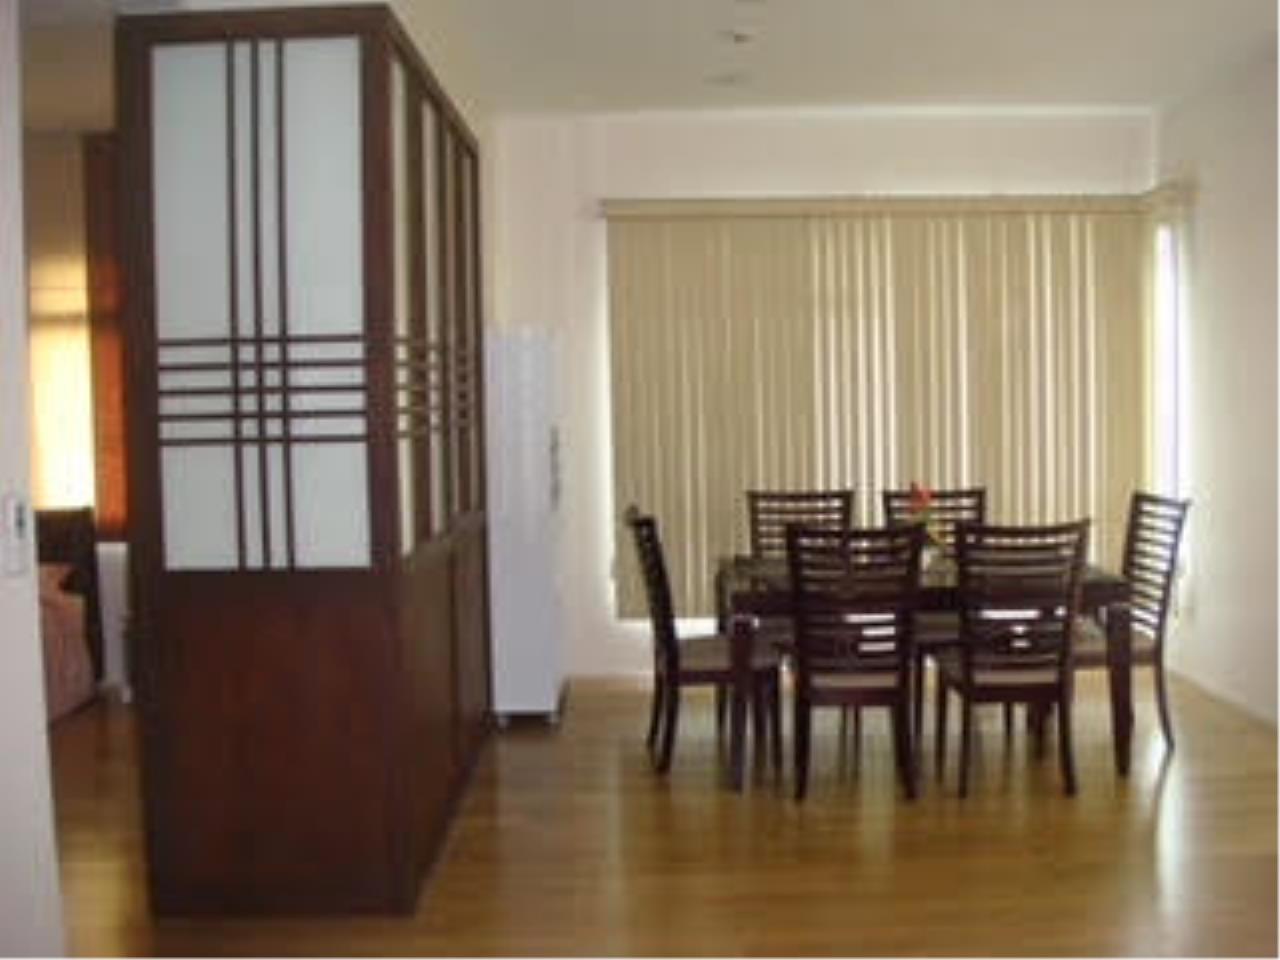 Right Move Thailand Agency's CA5486 Madison Condominium For Rent 90,000 THB - 3 Bedrooms - 160 sqm. 1